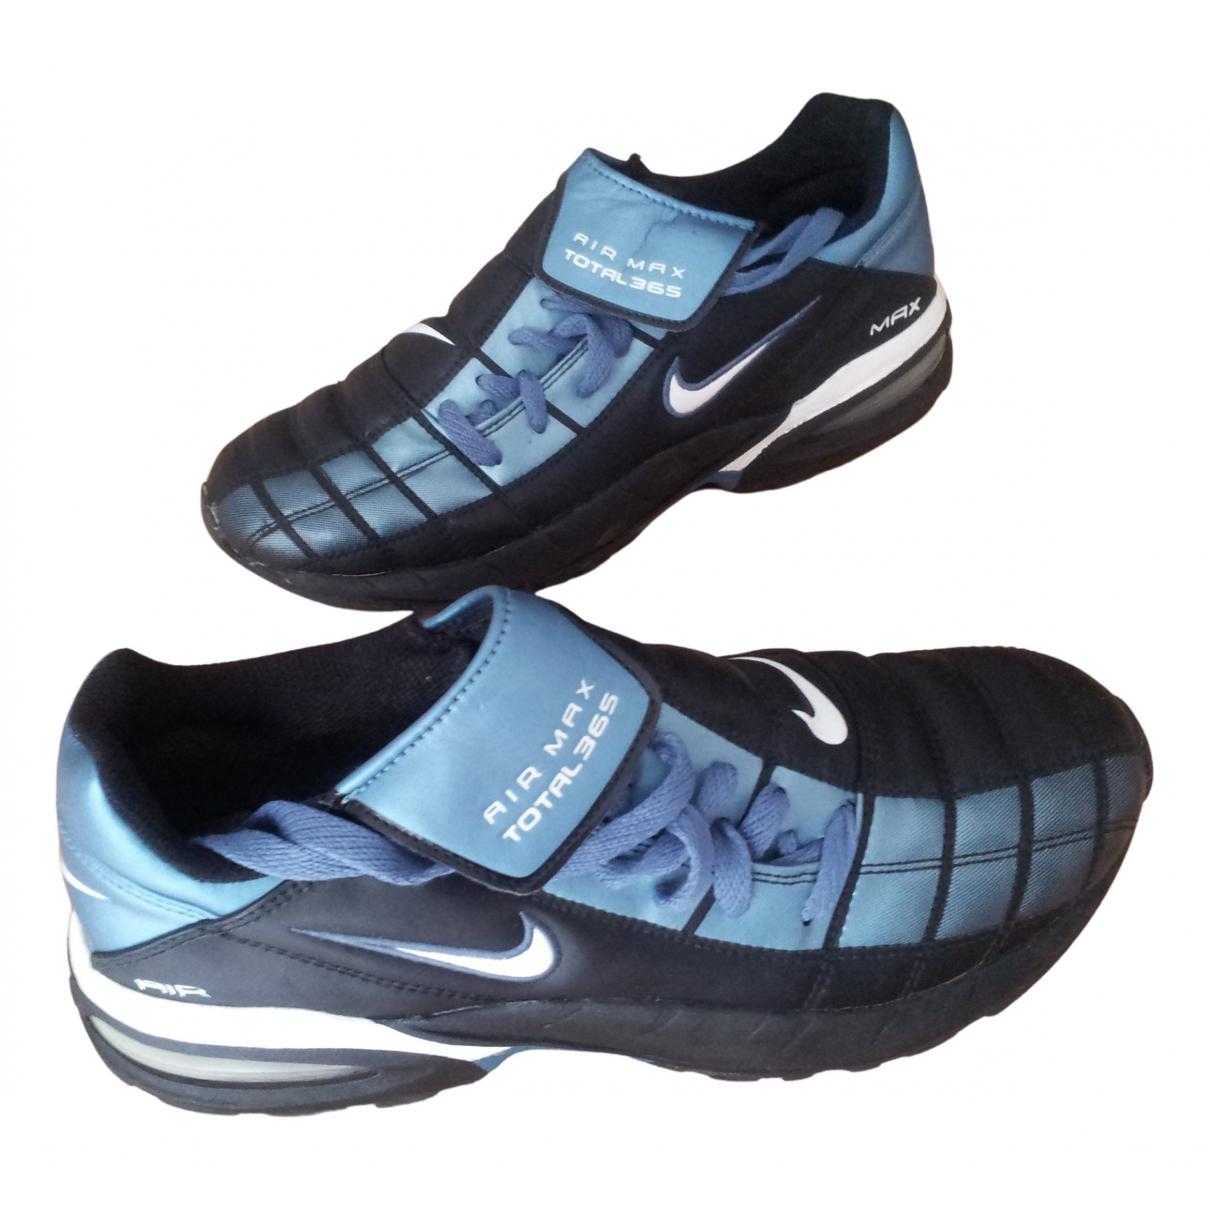 Nike Air Max  Sneakers in  Bunt Lackleder